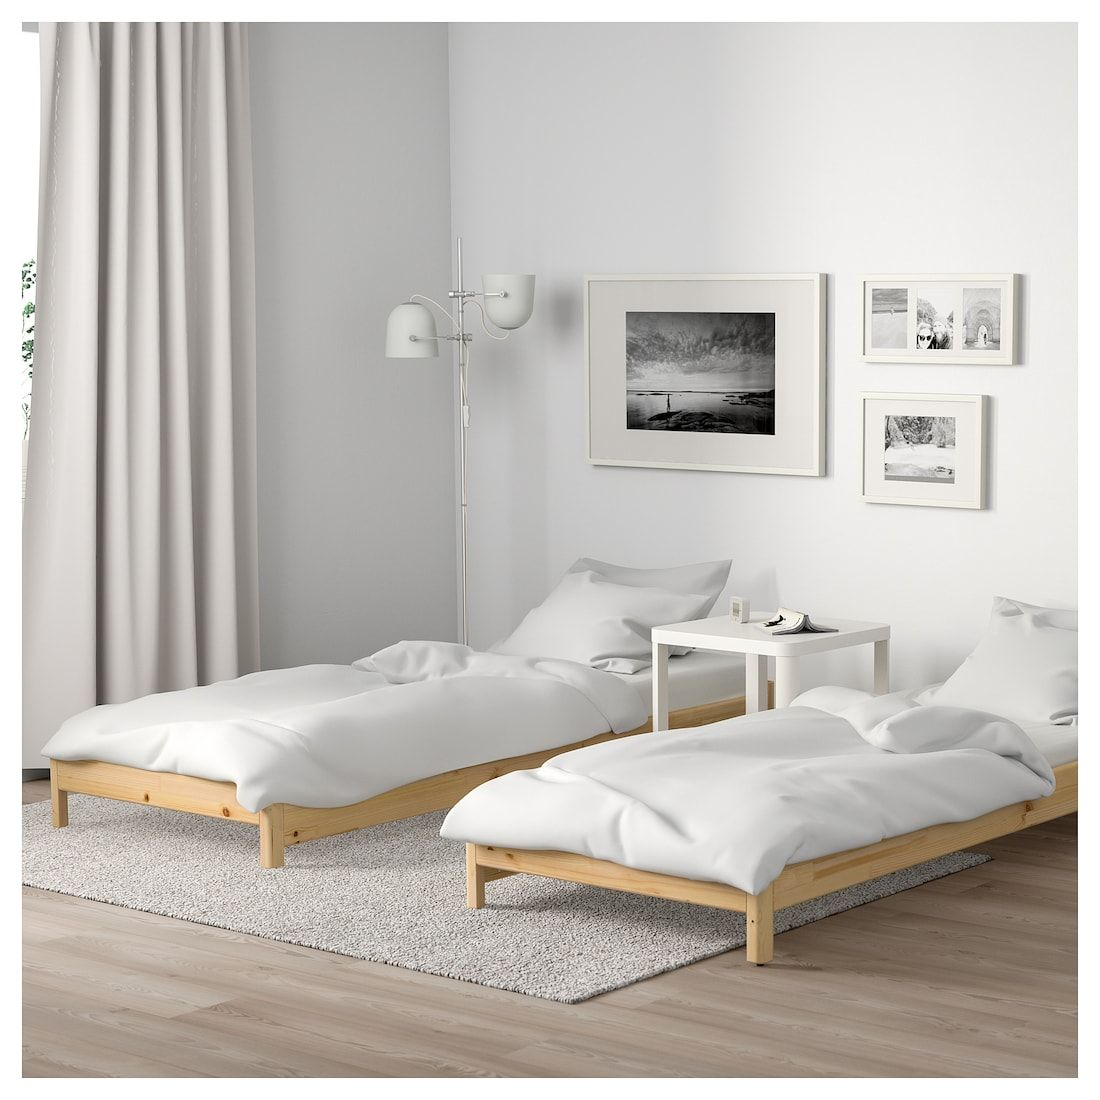 Utaker Stackable Bed With 2 Mattresses Pine Husvika Twin In